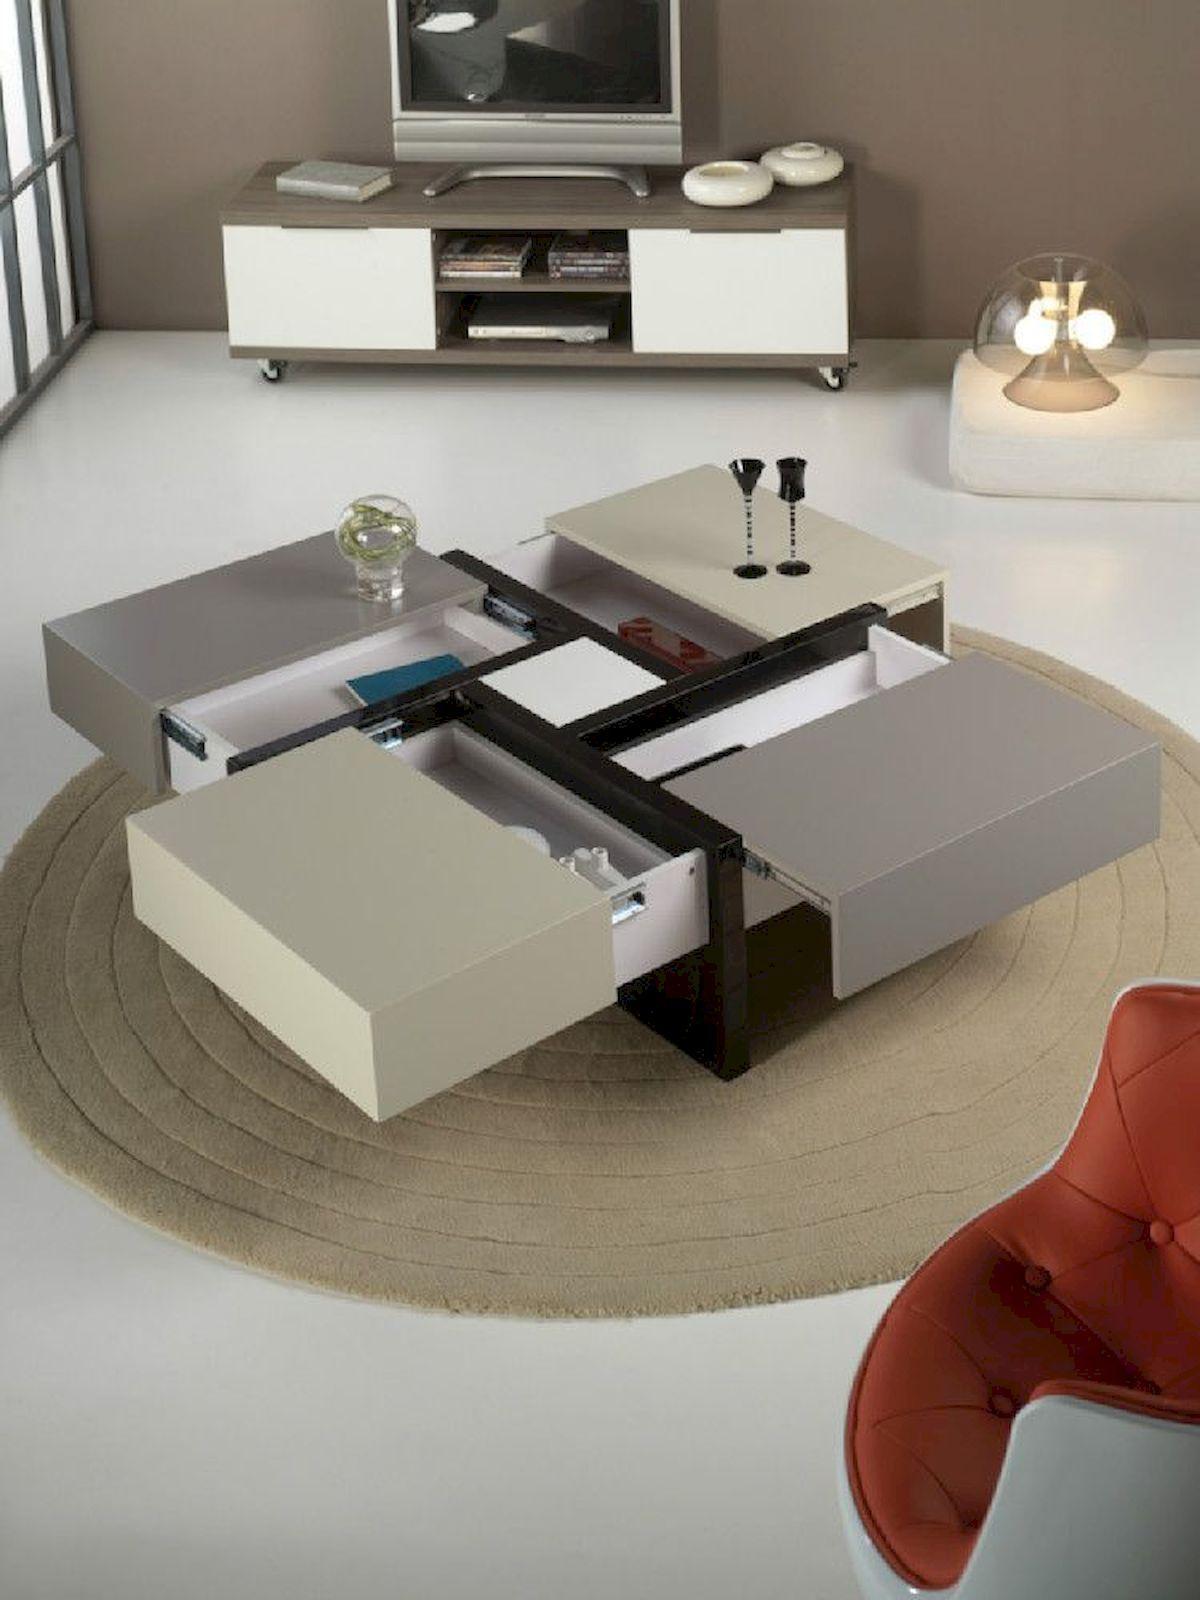 Coffee Table Ideas For Your Living Room Jihanshanum Furniture Design Living Room Center Table Living Room Living Room Table [ 1600 x 1200 Pixel ]